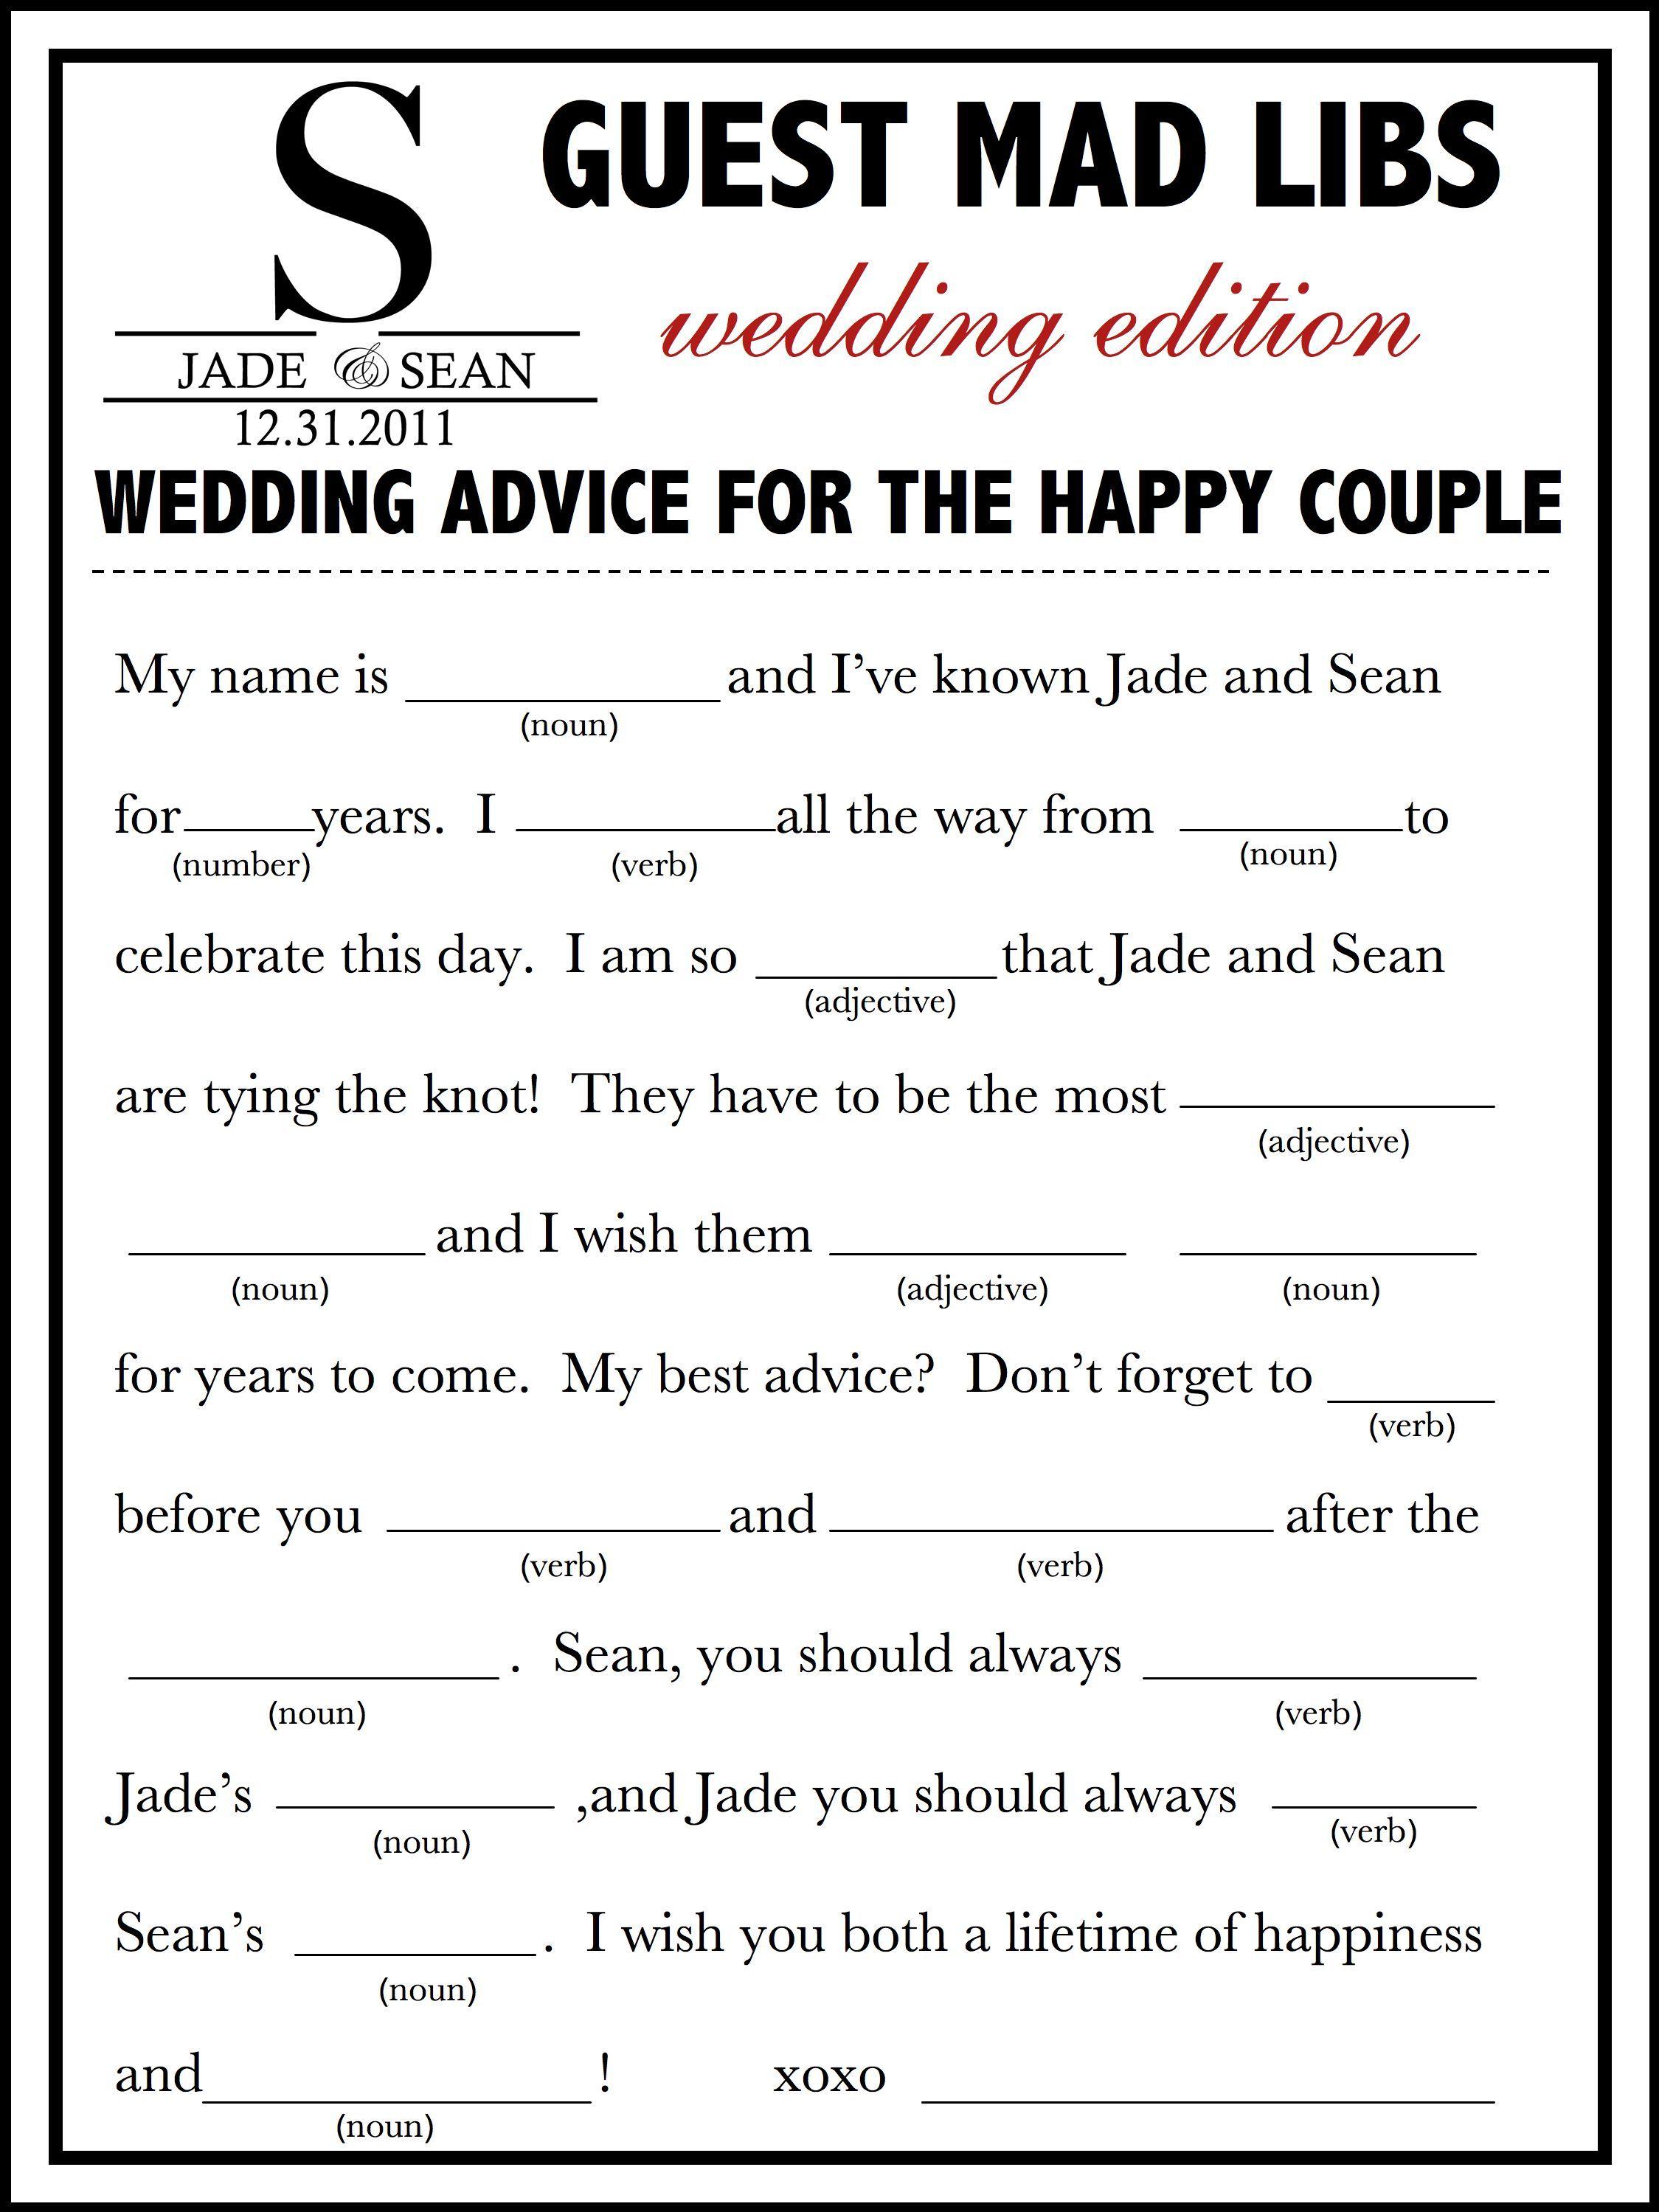 Wedding Mad Libs Template Free  Fun Unique Guest Book Alternative Perfect  For Destination Wedding